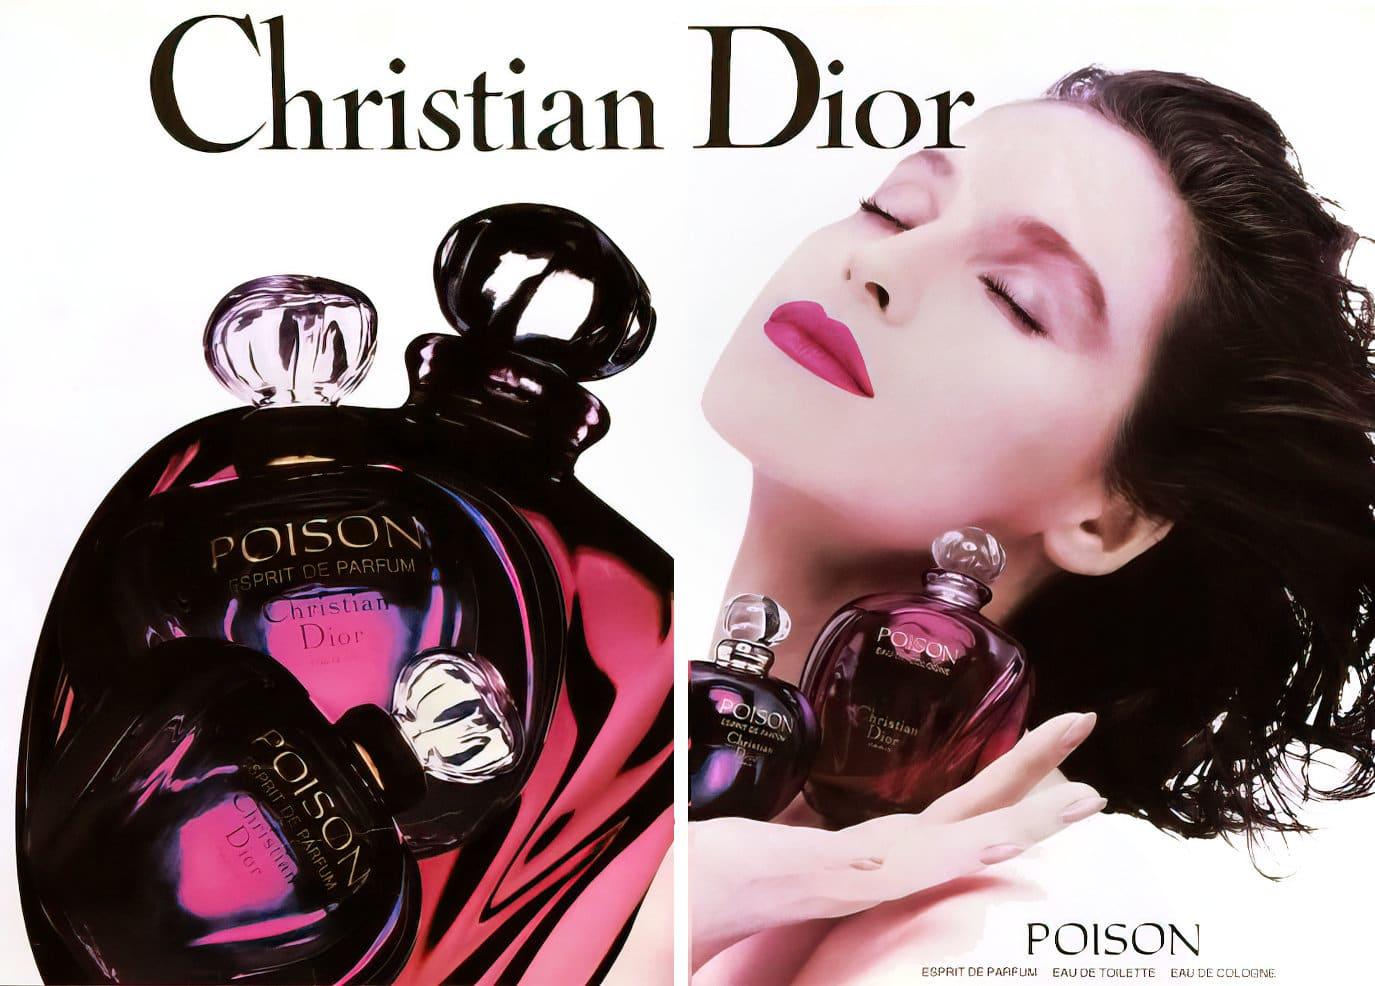 Poison fragrance by Christian Dior (1990) at ClickAmericana.com